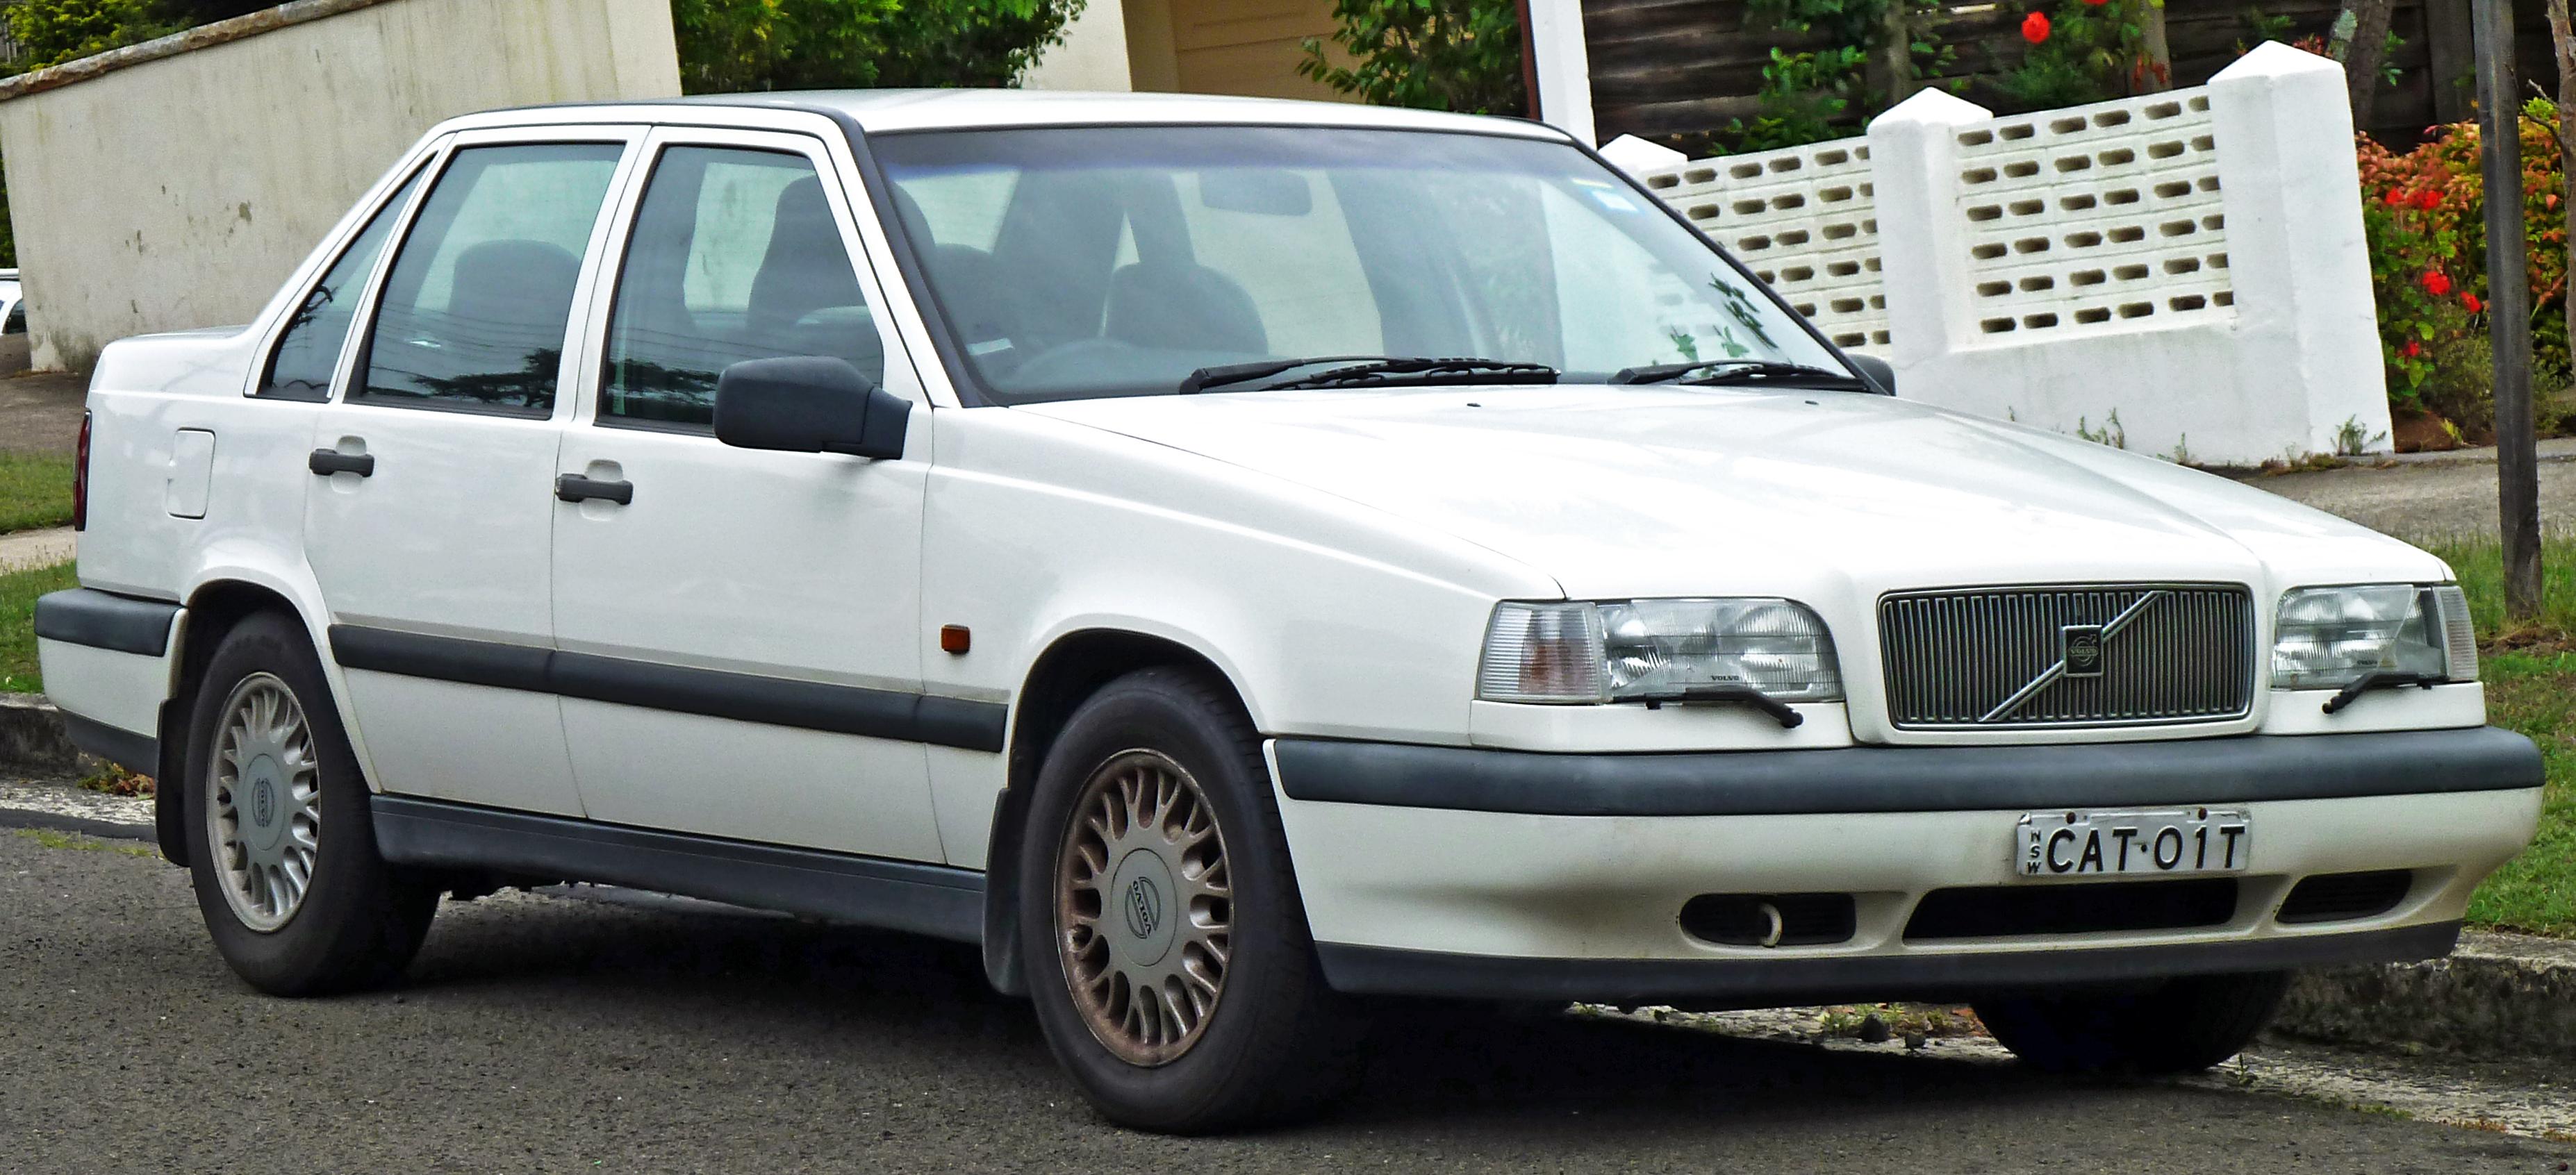 File:1994-1997 Volvo 850 SE 2.5 sedan (2011-01-13) 01.jpg - Wikimedia Commons